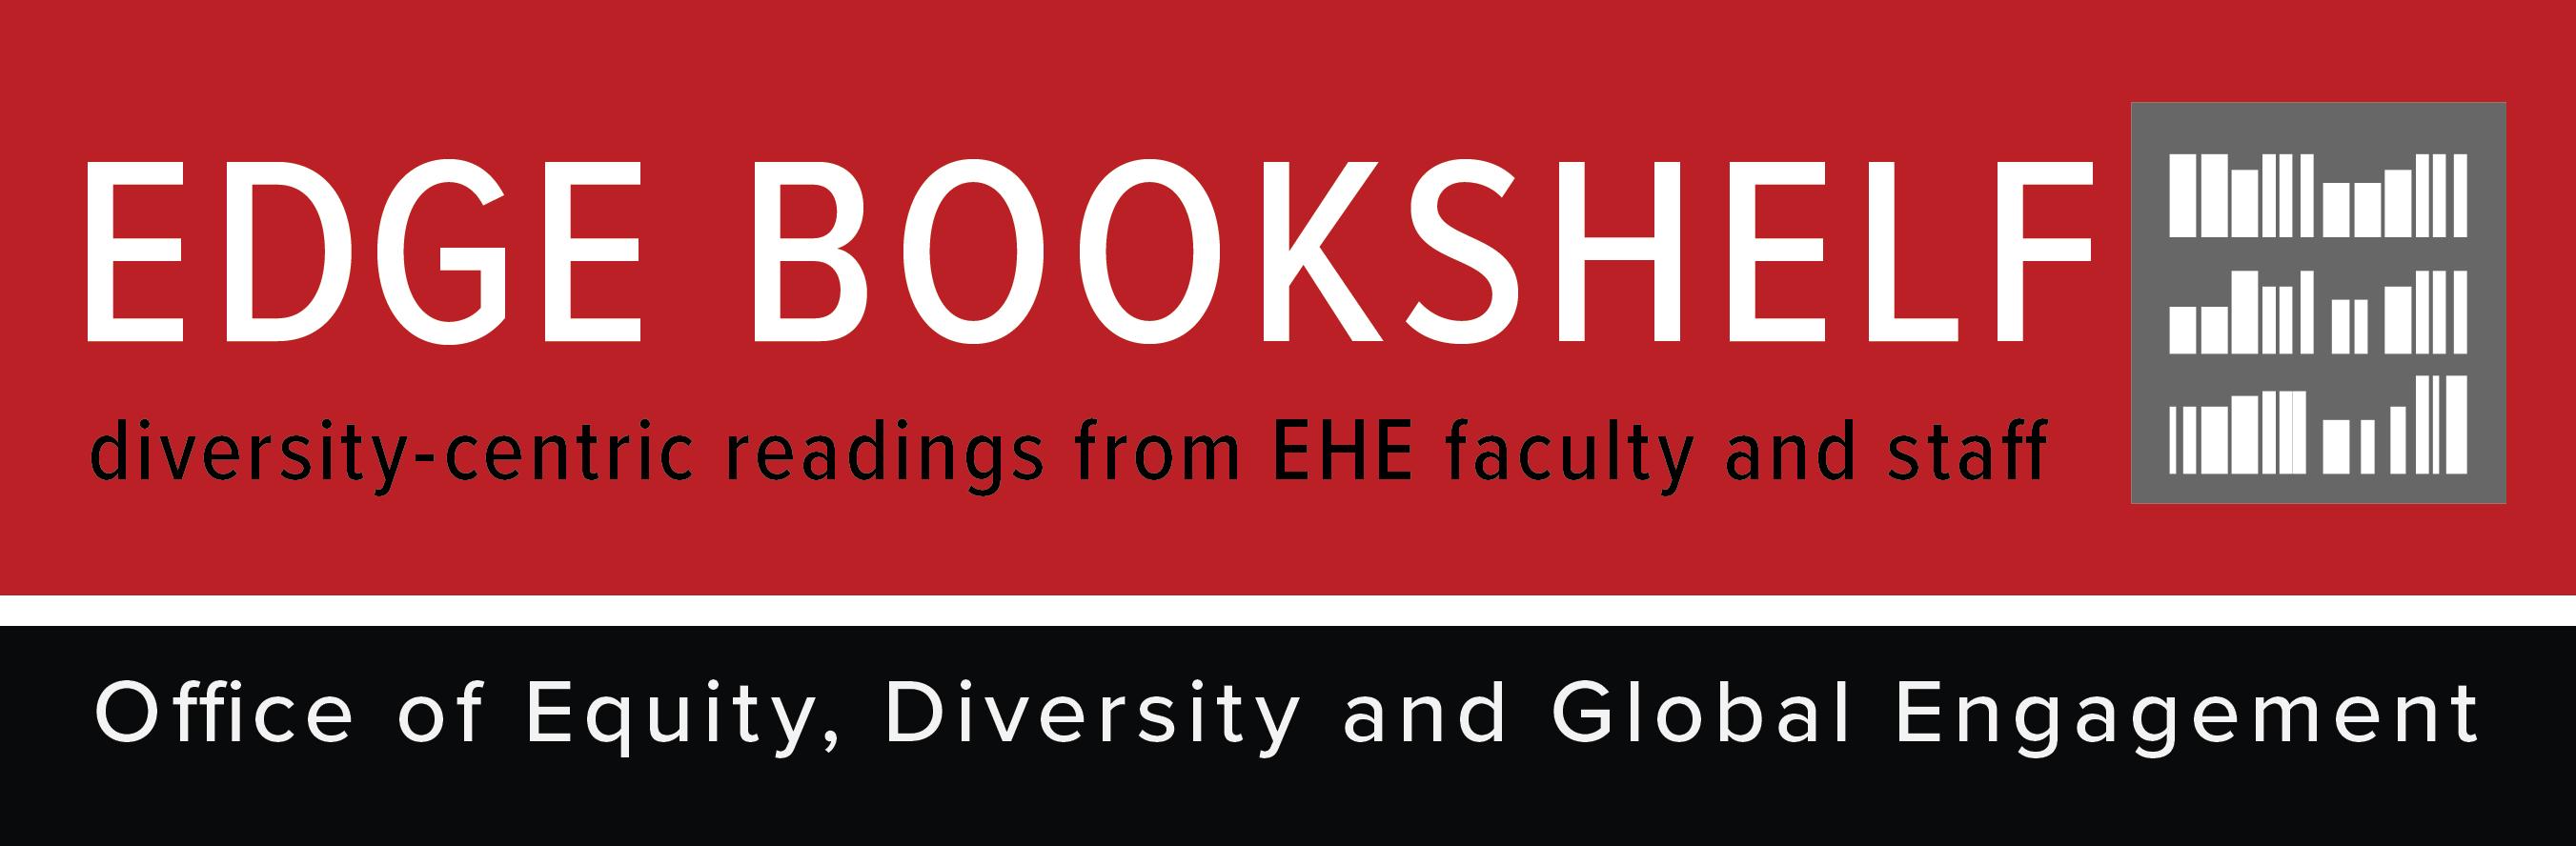 EDGE Bookshelf Logo